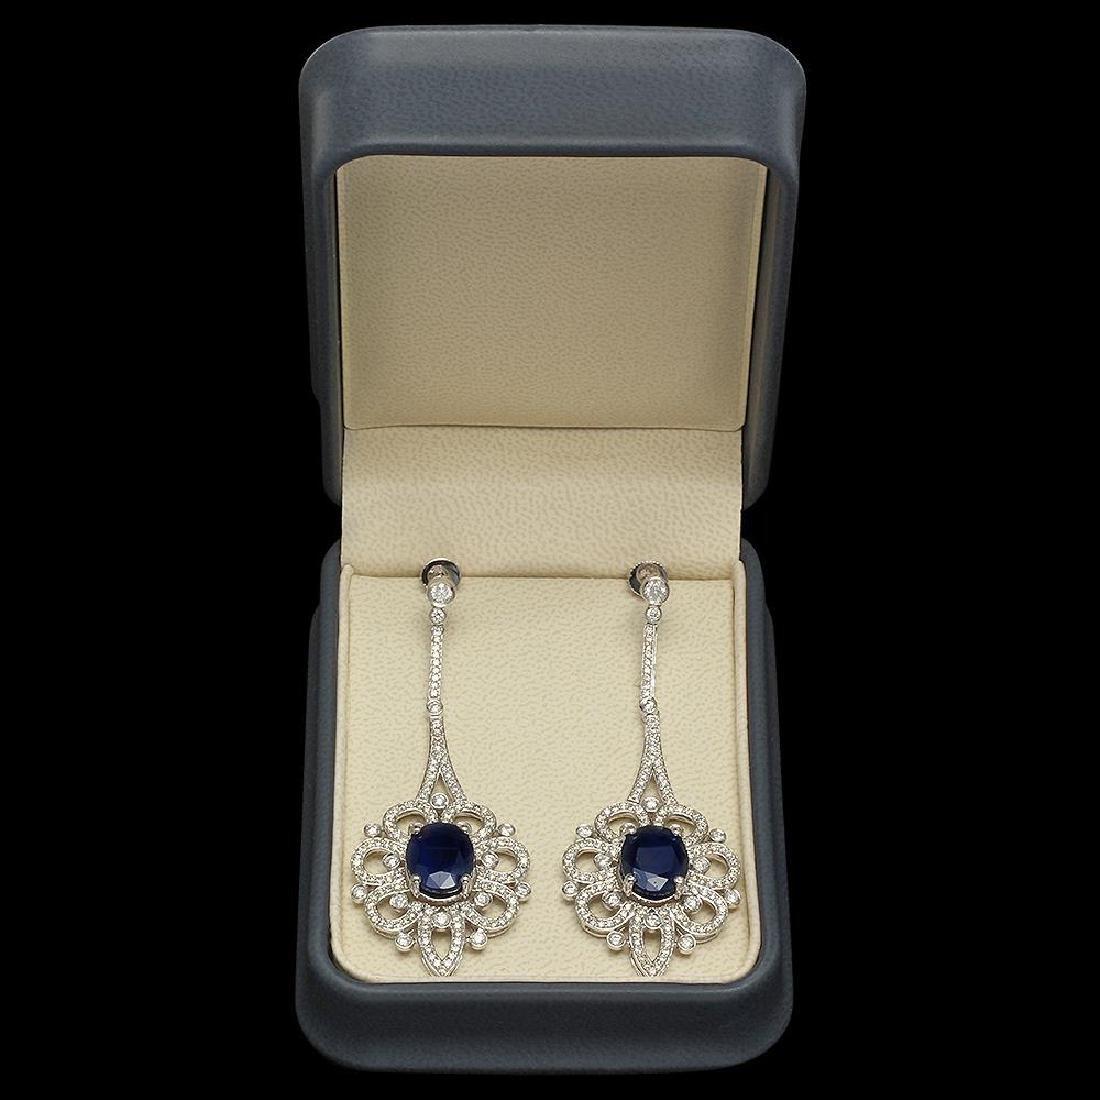 18K Gold 13.64ct Sapphire 4.08ct Diamond Earrings - 3